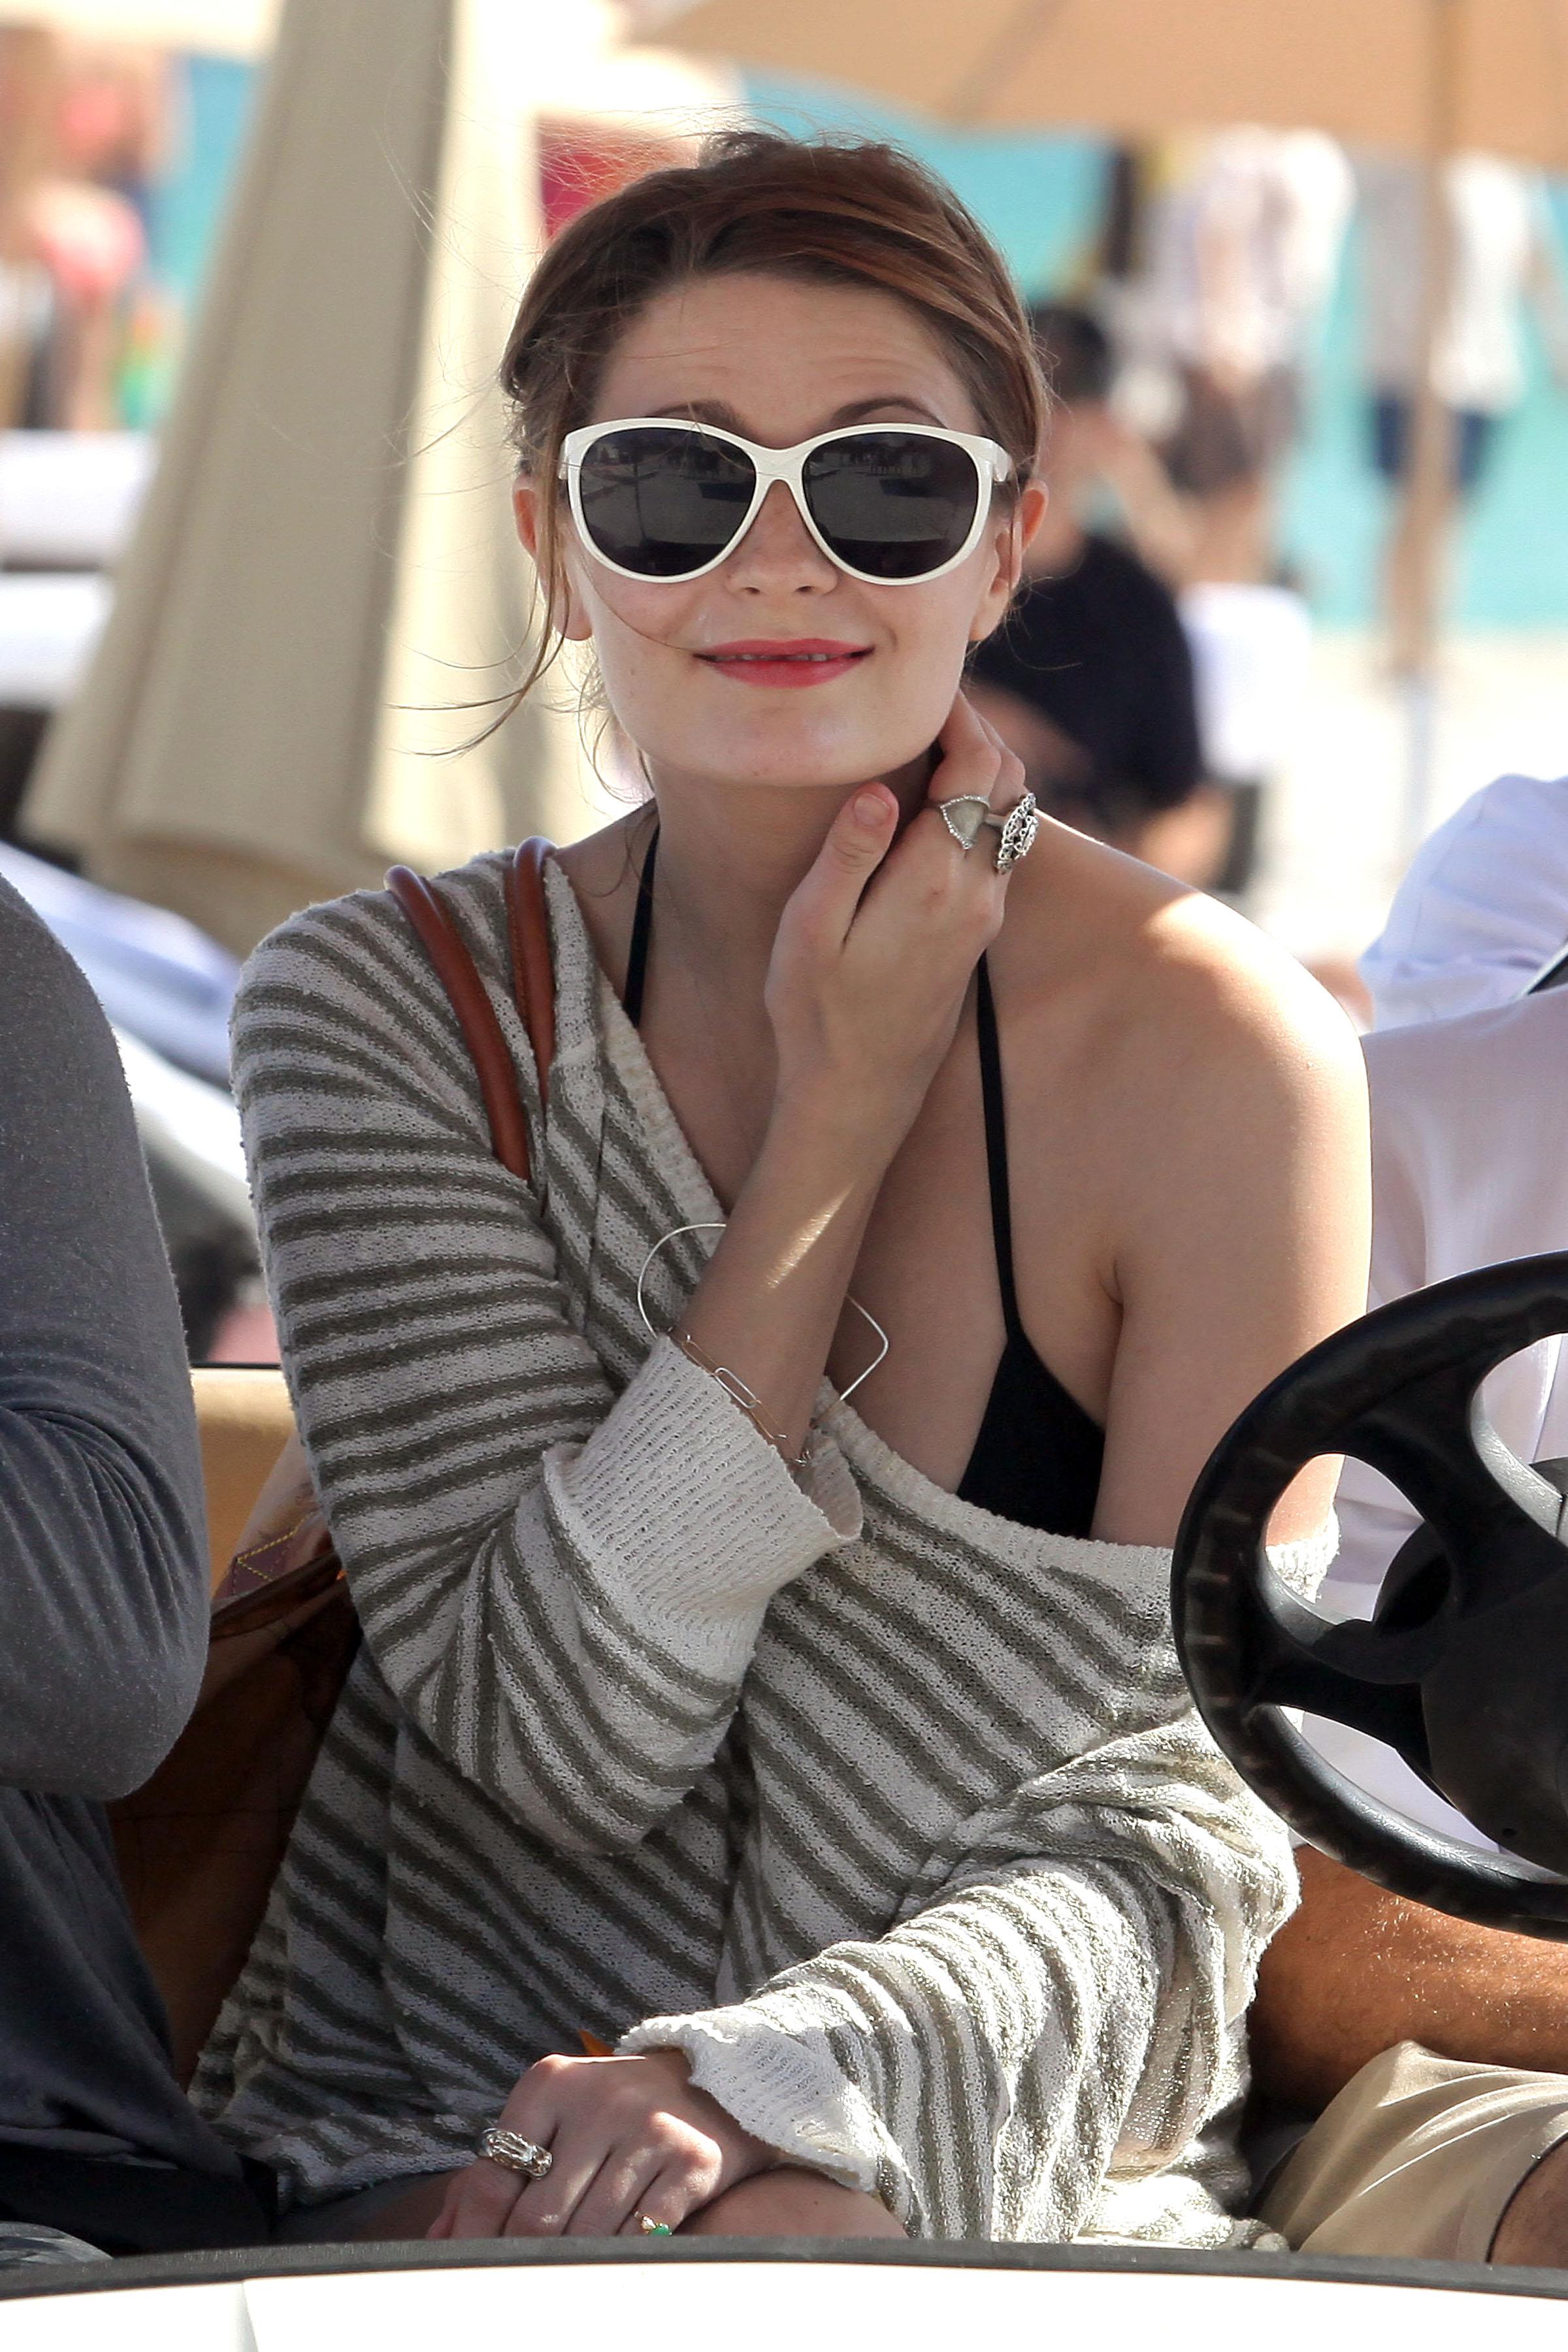 312186581_Mischa_Barton_Bikini_Candids_on_the_Beach_in_Miami_December_27_2011_143_122_74lo.jpg